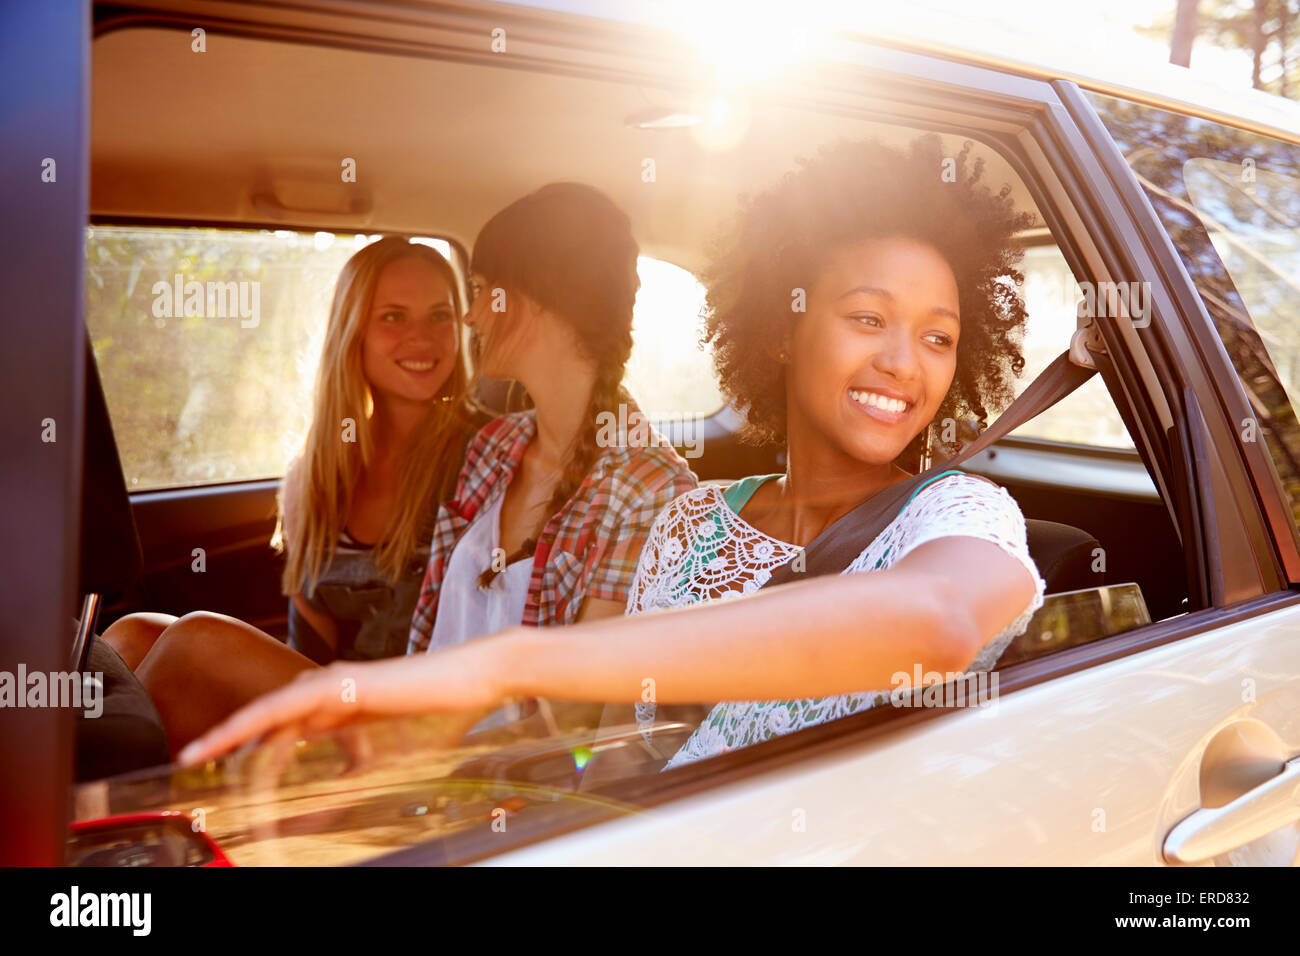 Three Women Sitting In Rear Seat Of Car On Road Trip - Stock Image